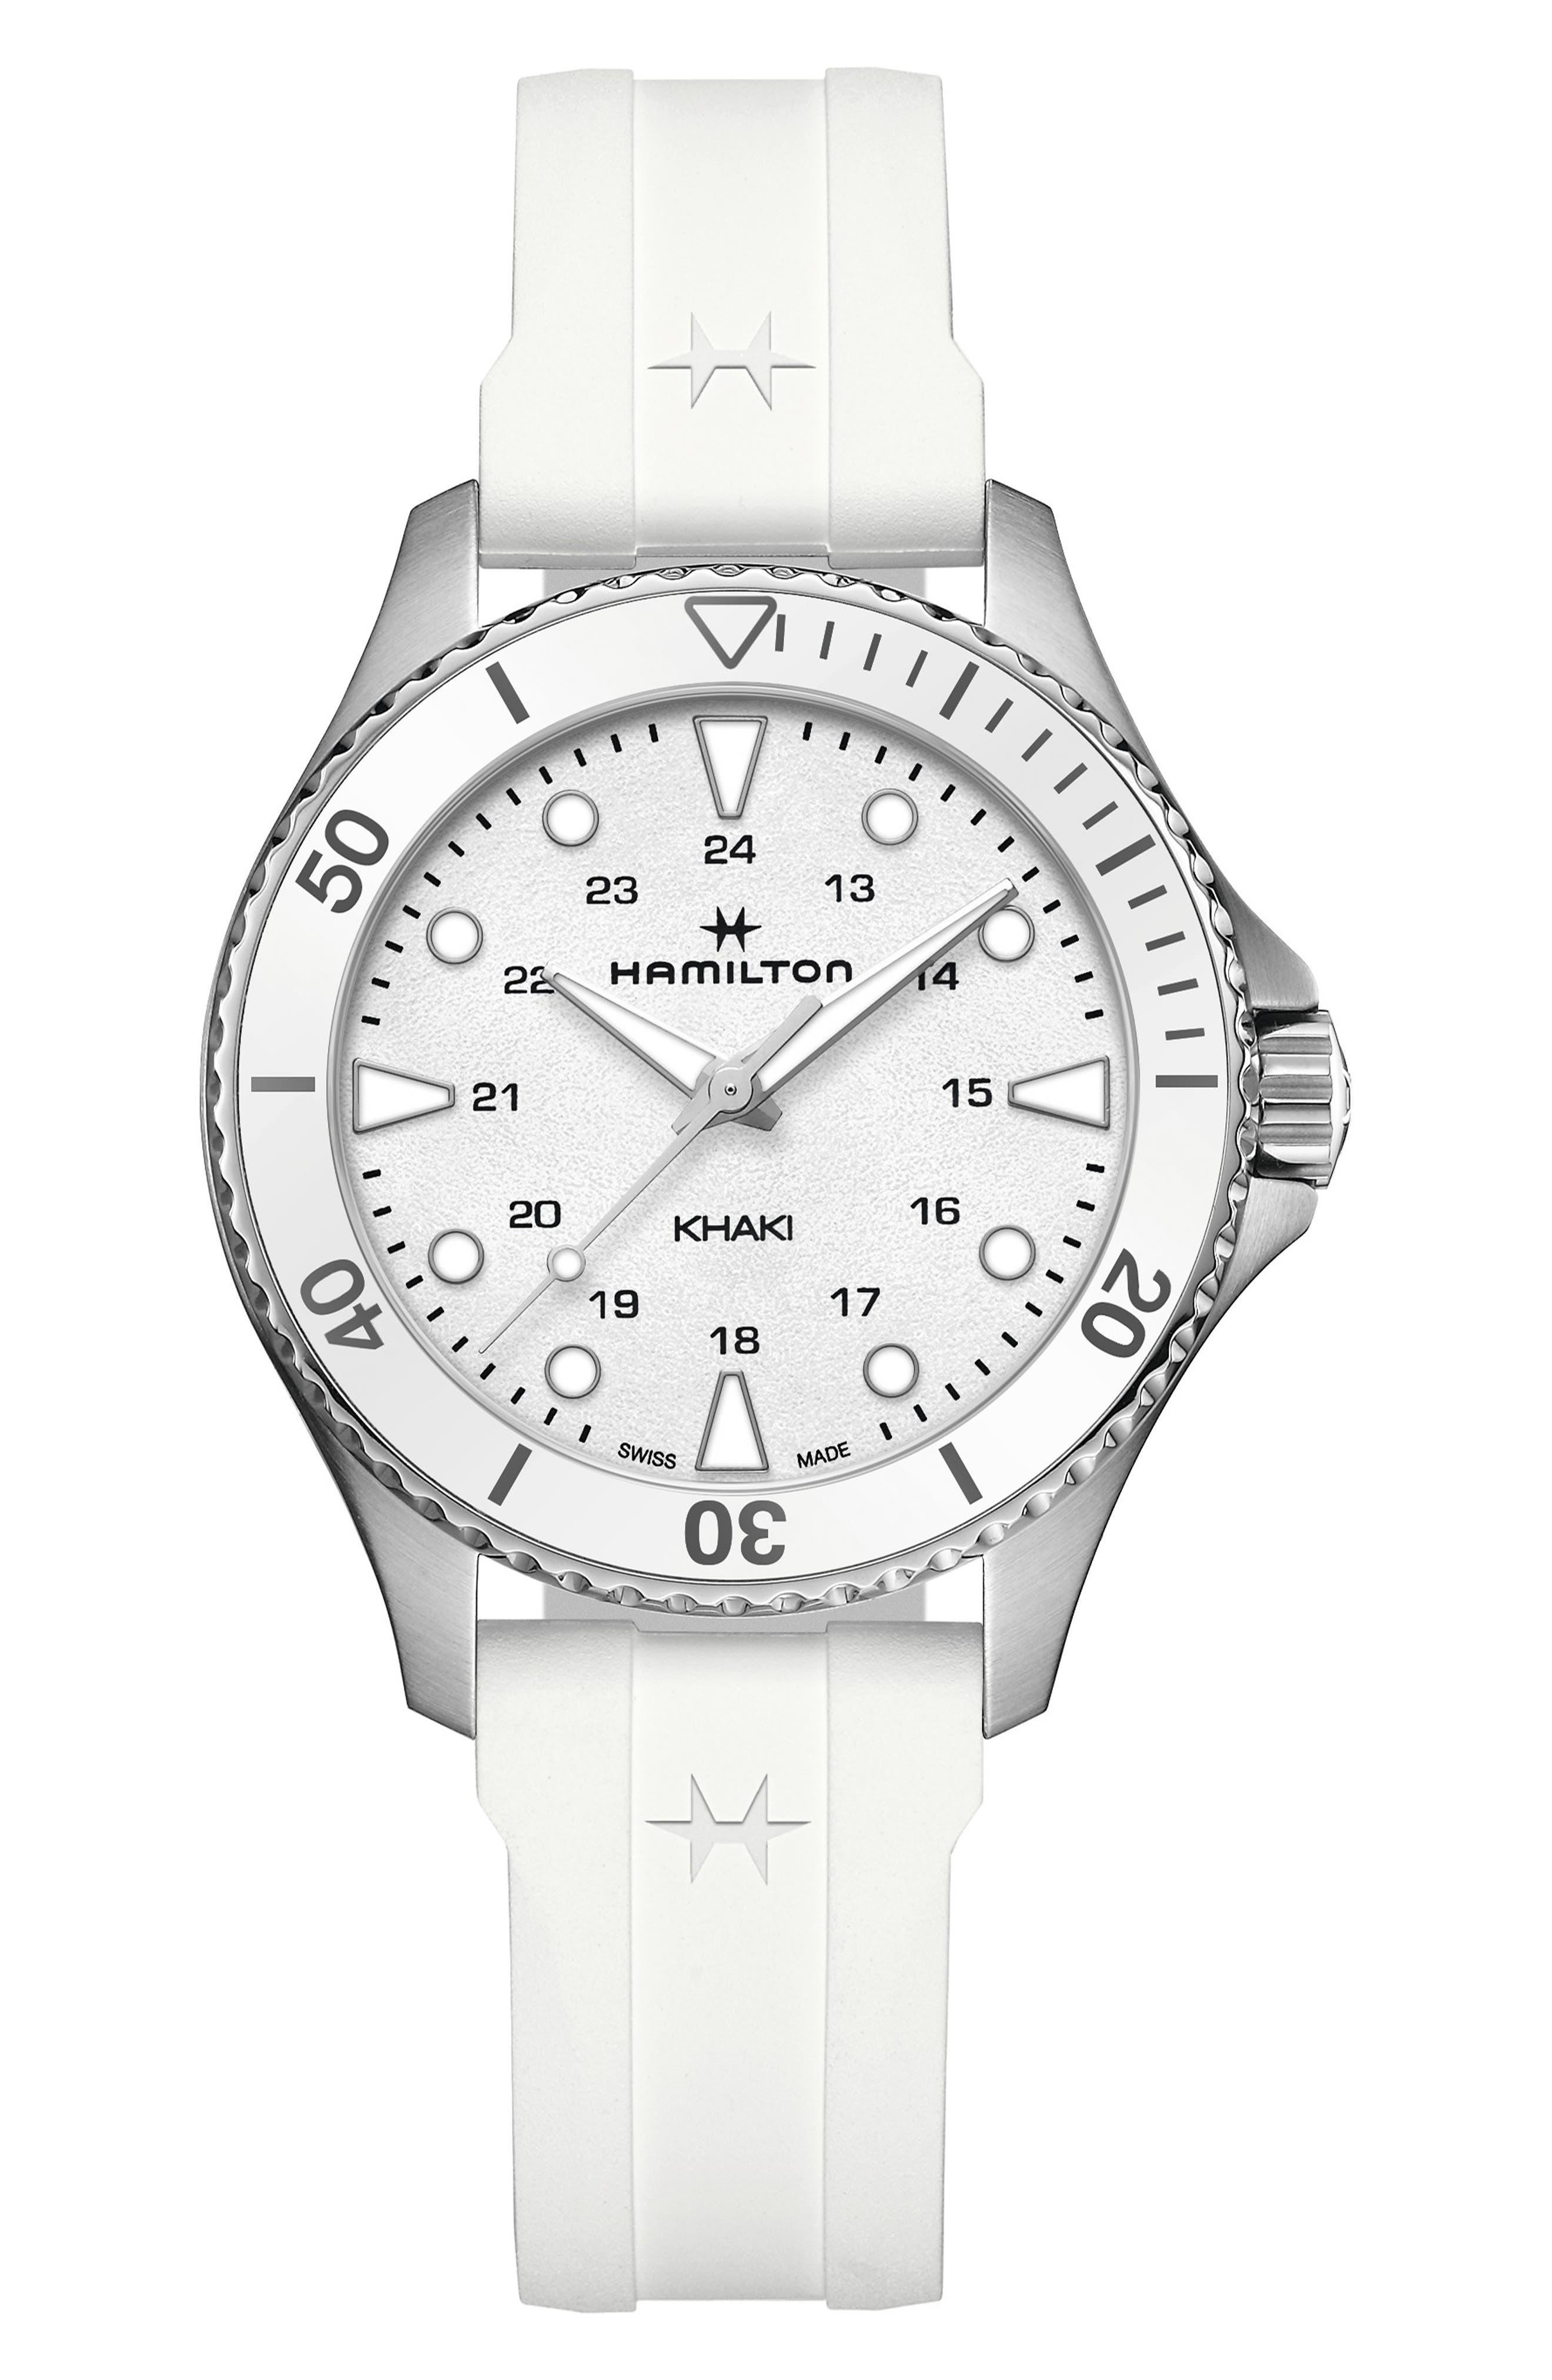 Khaki Navy Scuba Quartz Rubber Strap Watch